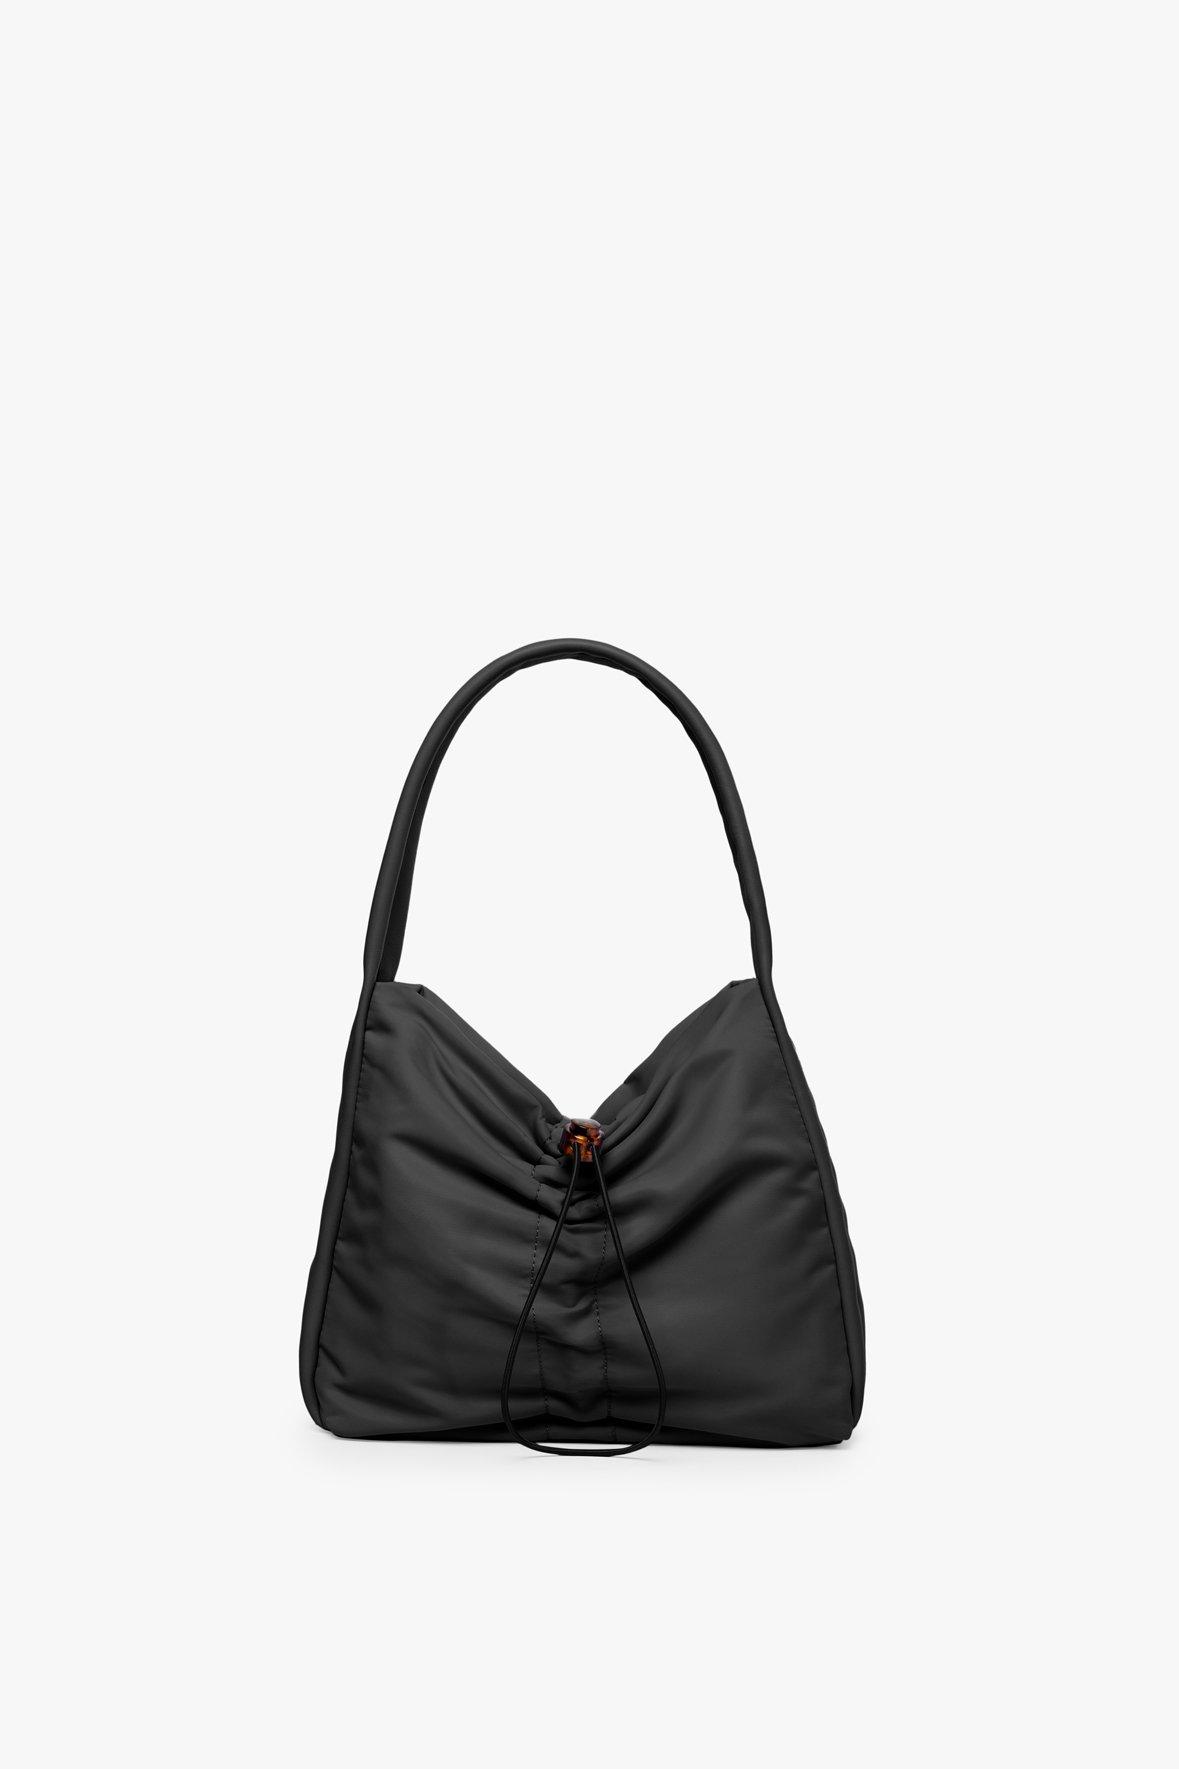 FELIX NYLON SHOULDER BAG | BLACK by Staud for $195 Hailey Baldwin Bags Exact Product